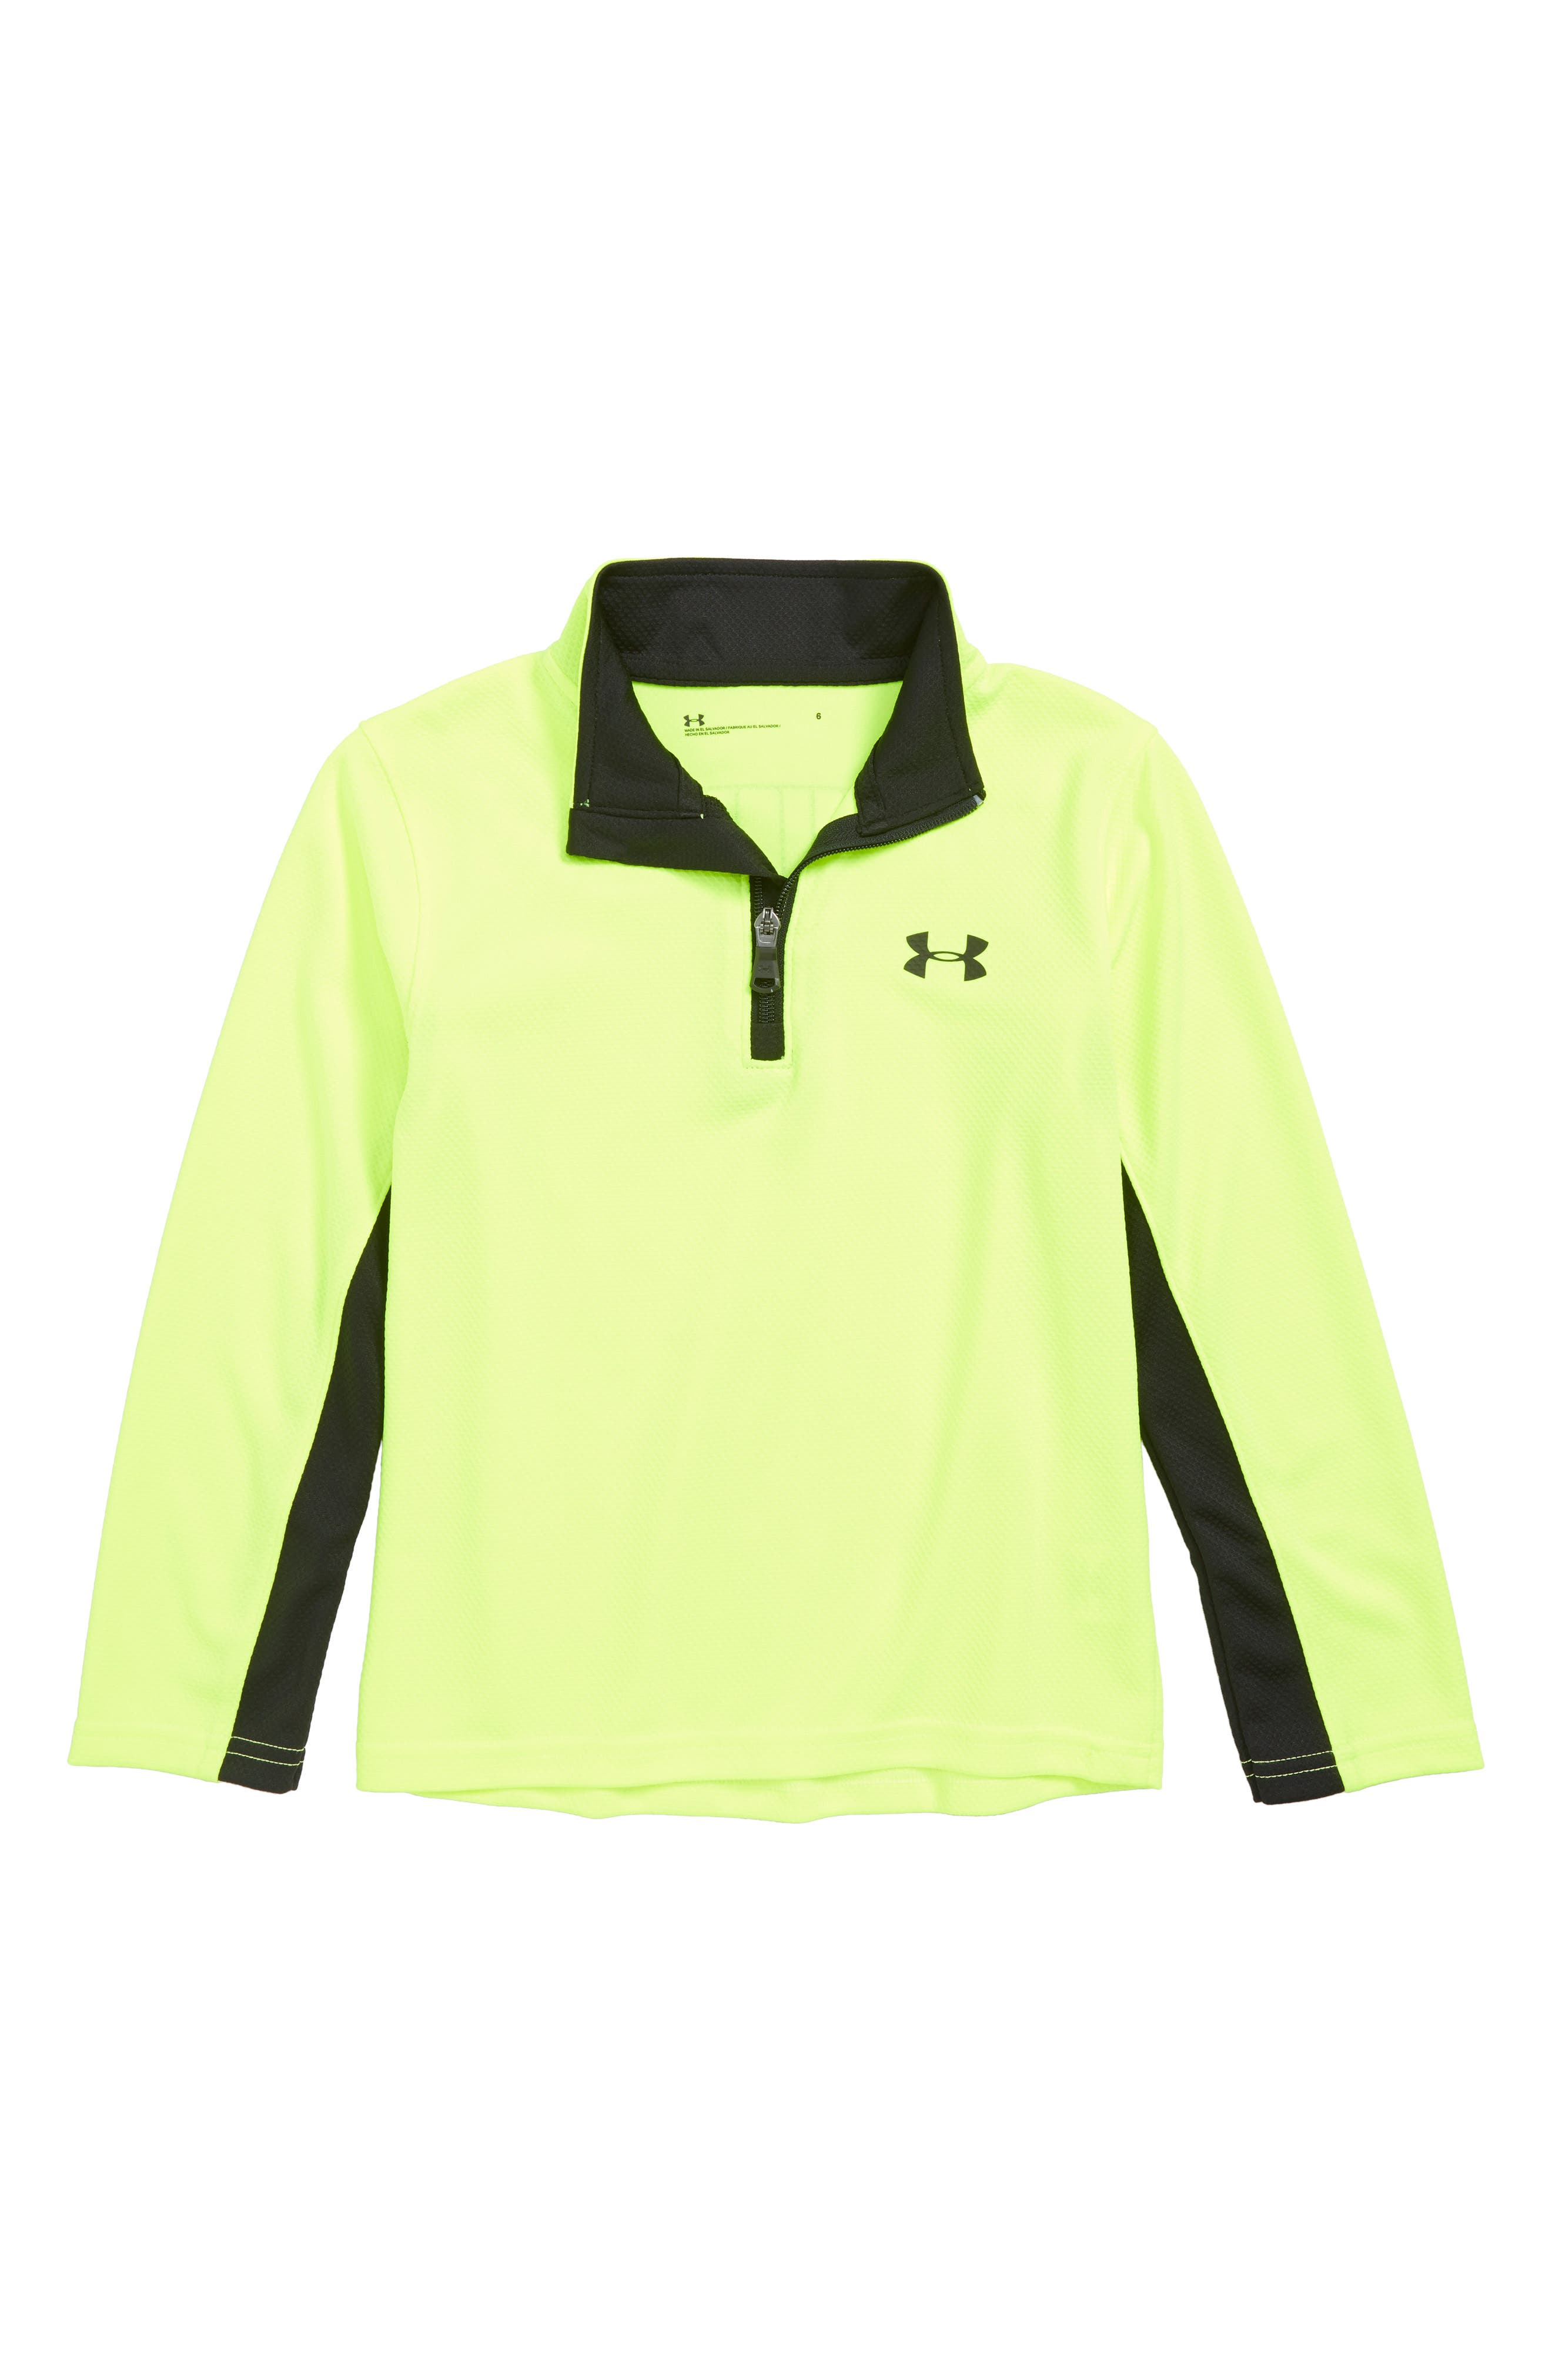 MVP Quarter Zip Pullover,                         Main,                         color, YELLOW